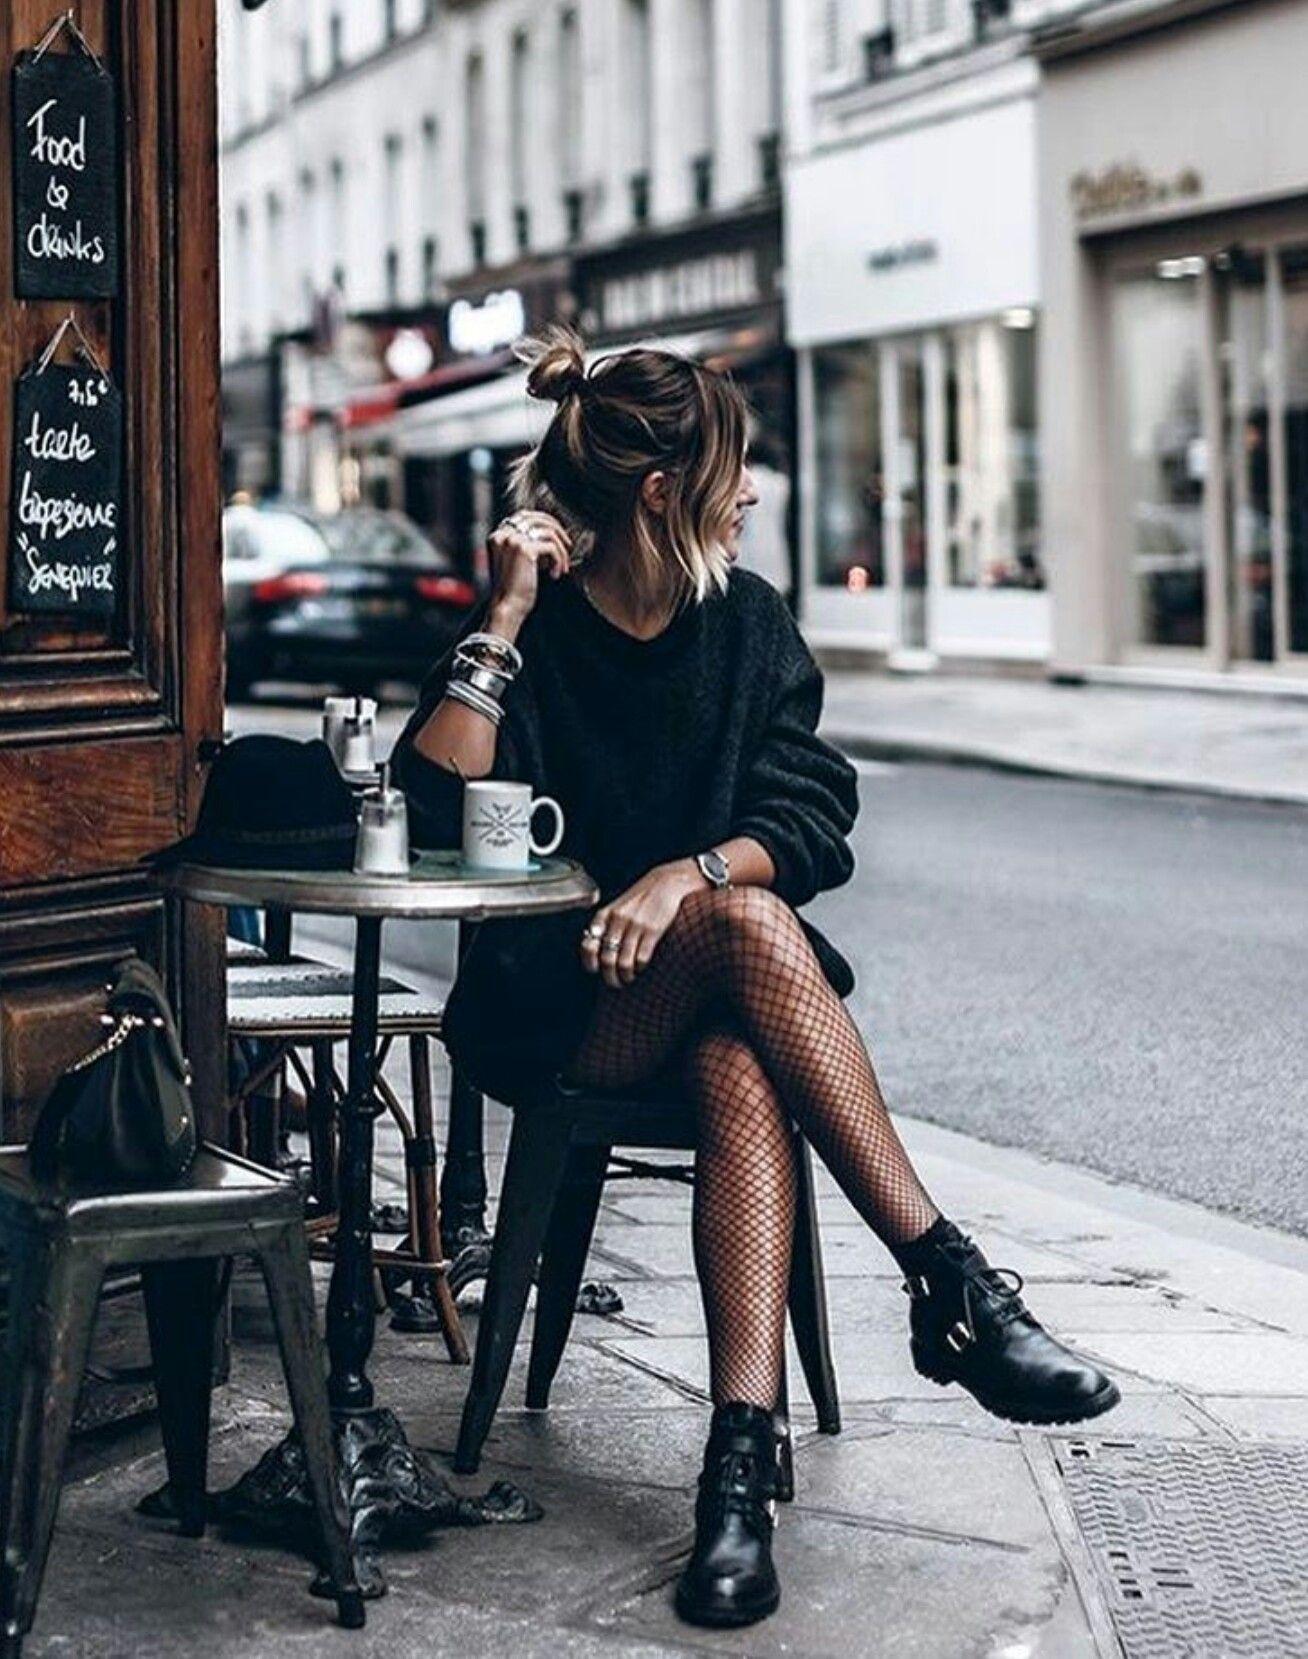 Netzstrumpfhose l ssig fashion pinterest outfit - Frauen style ideen ...